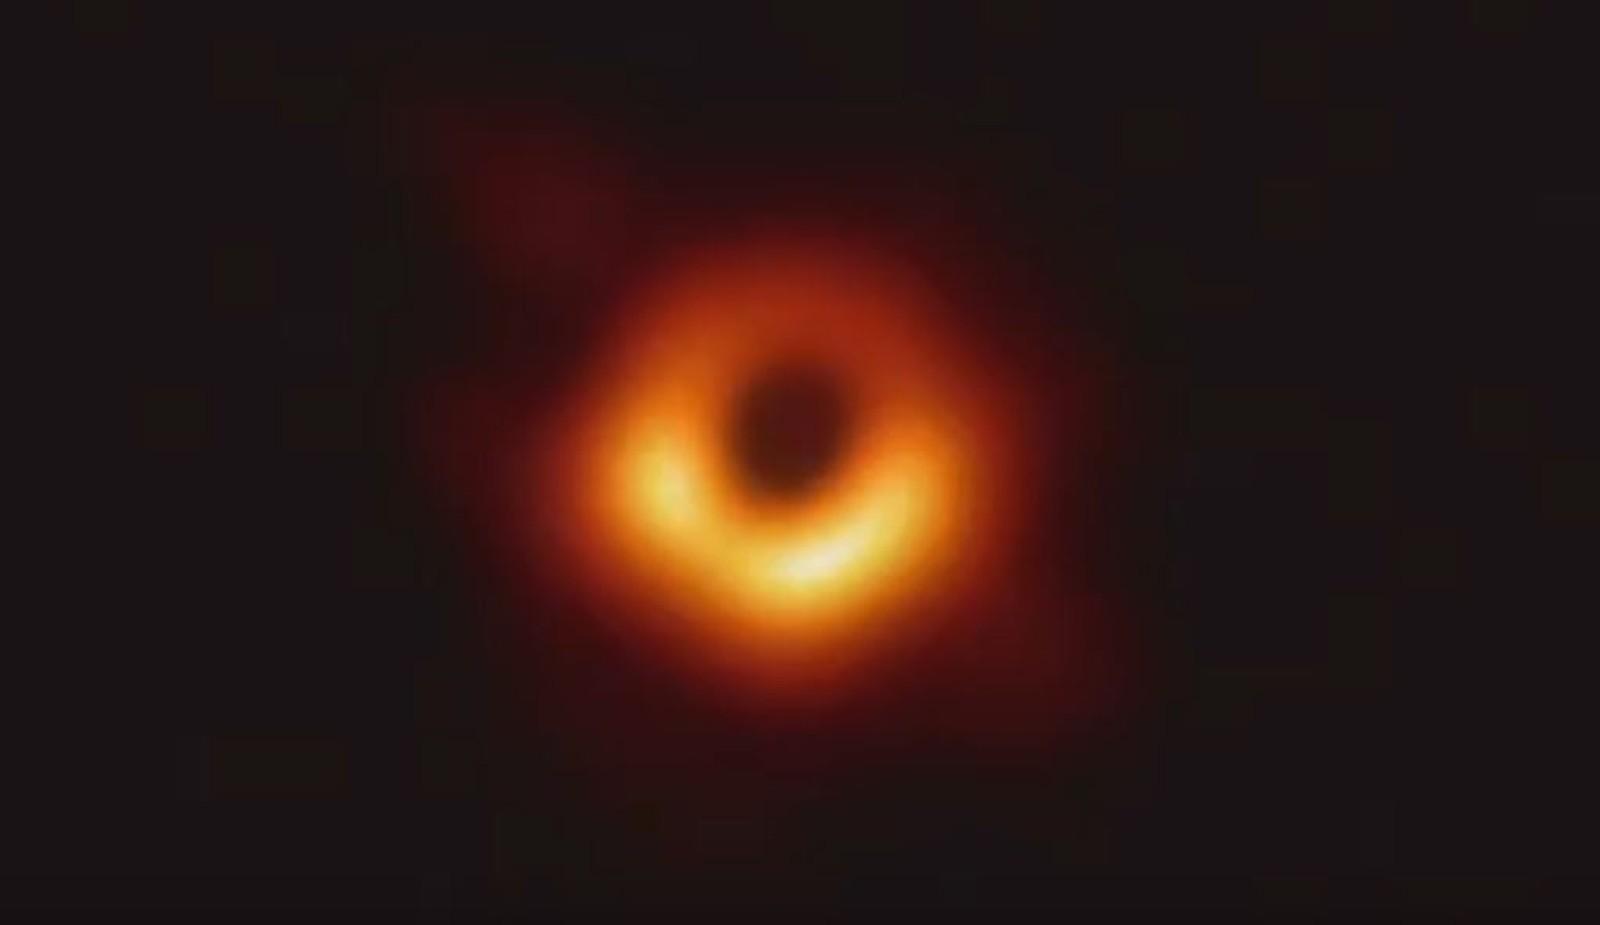 buraco negro primeira foto